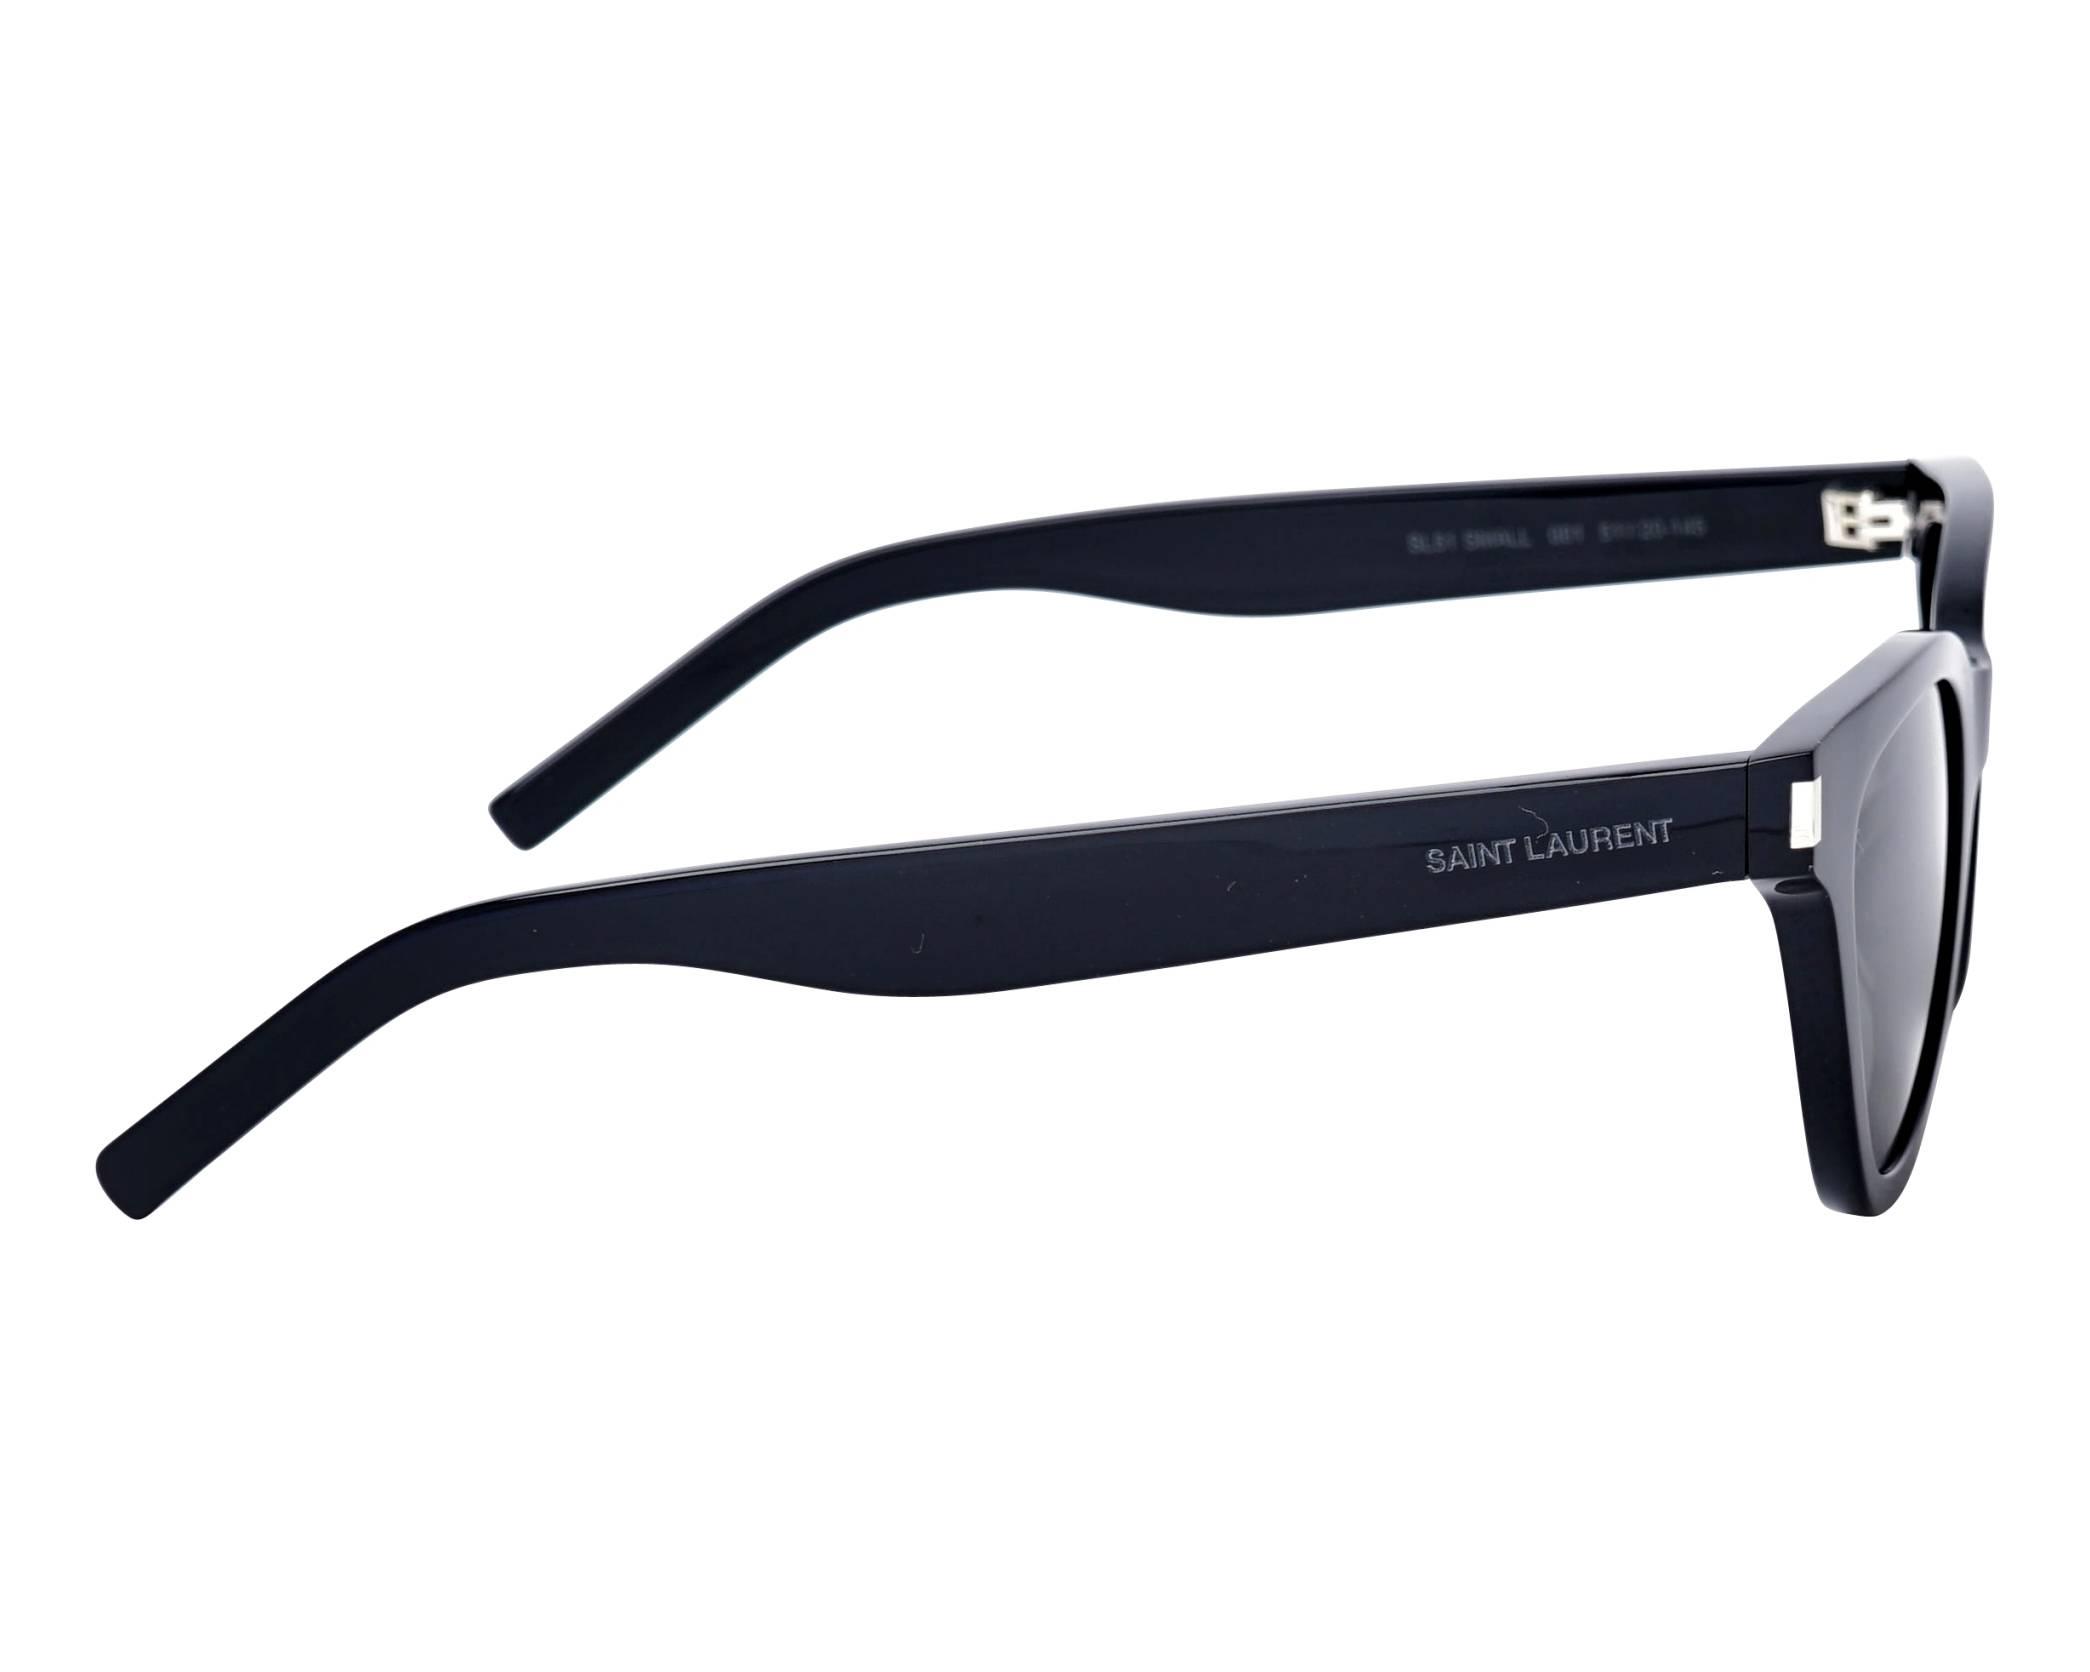 df98c9252bde Sunglasses Yves Saint Laurent SL-51-SMALL 001 51-20 Black side view